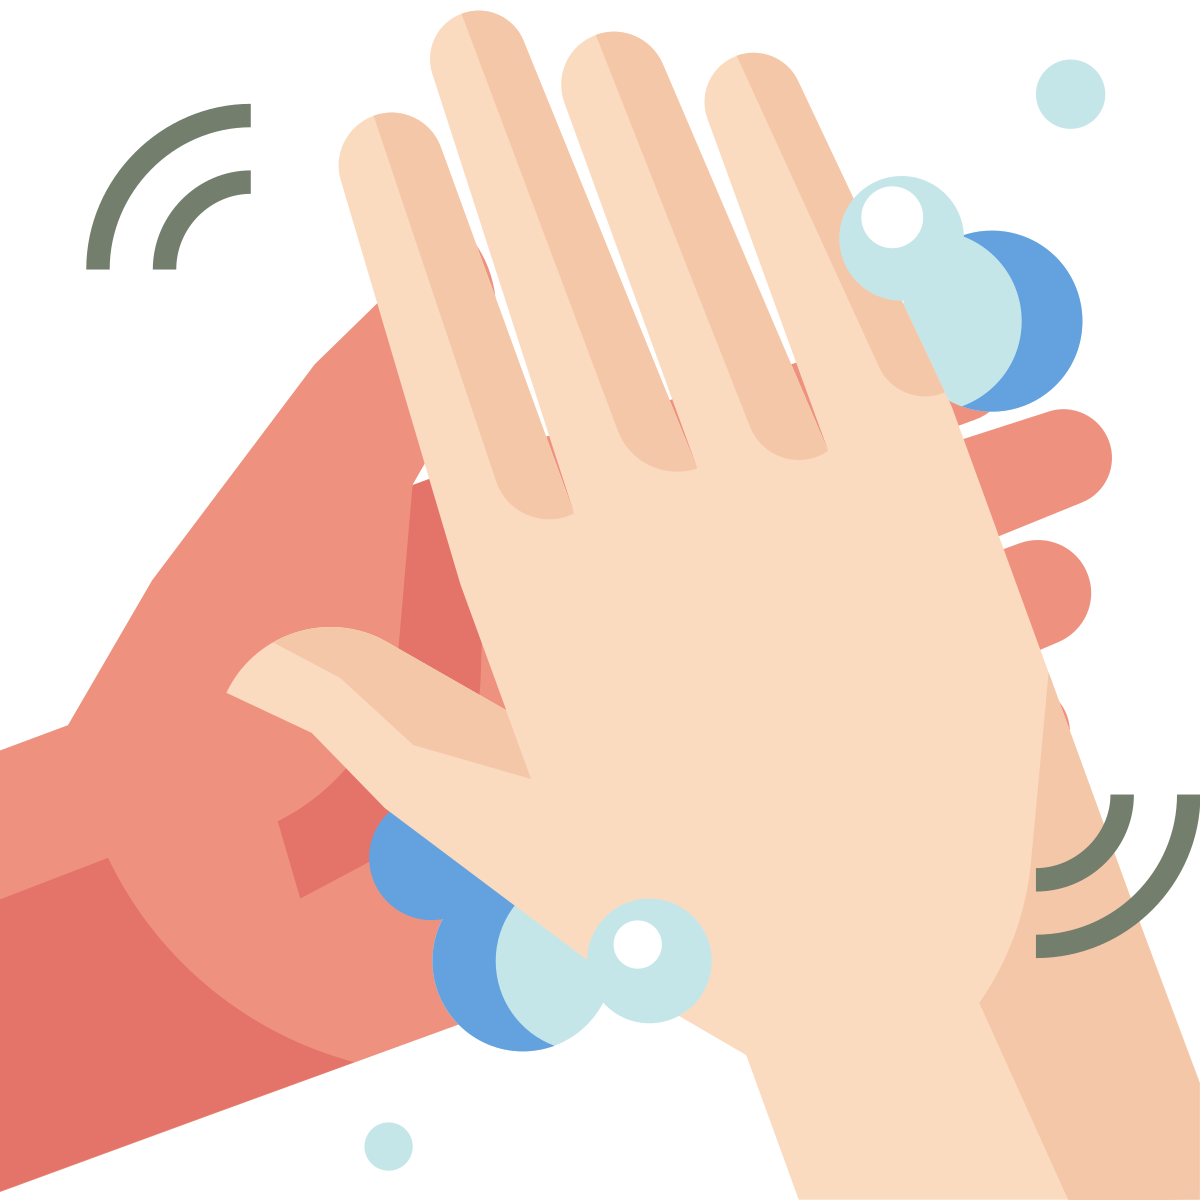 coronavirus  health  rub hands  sanitized  covid19  wash hands  hygiene icon icon